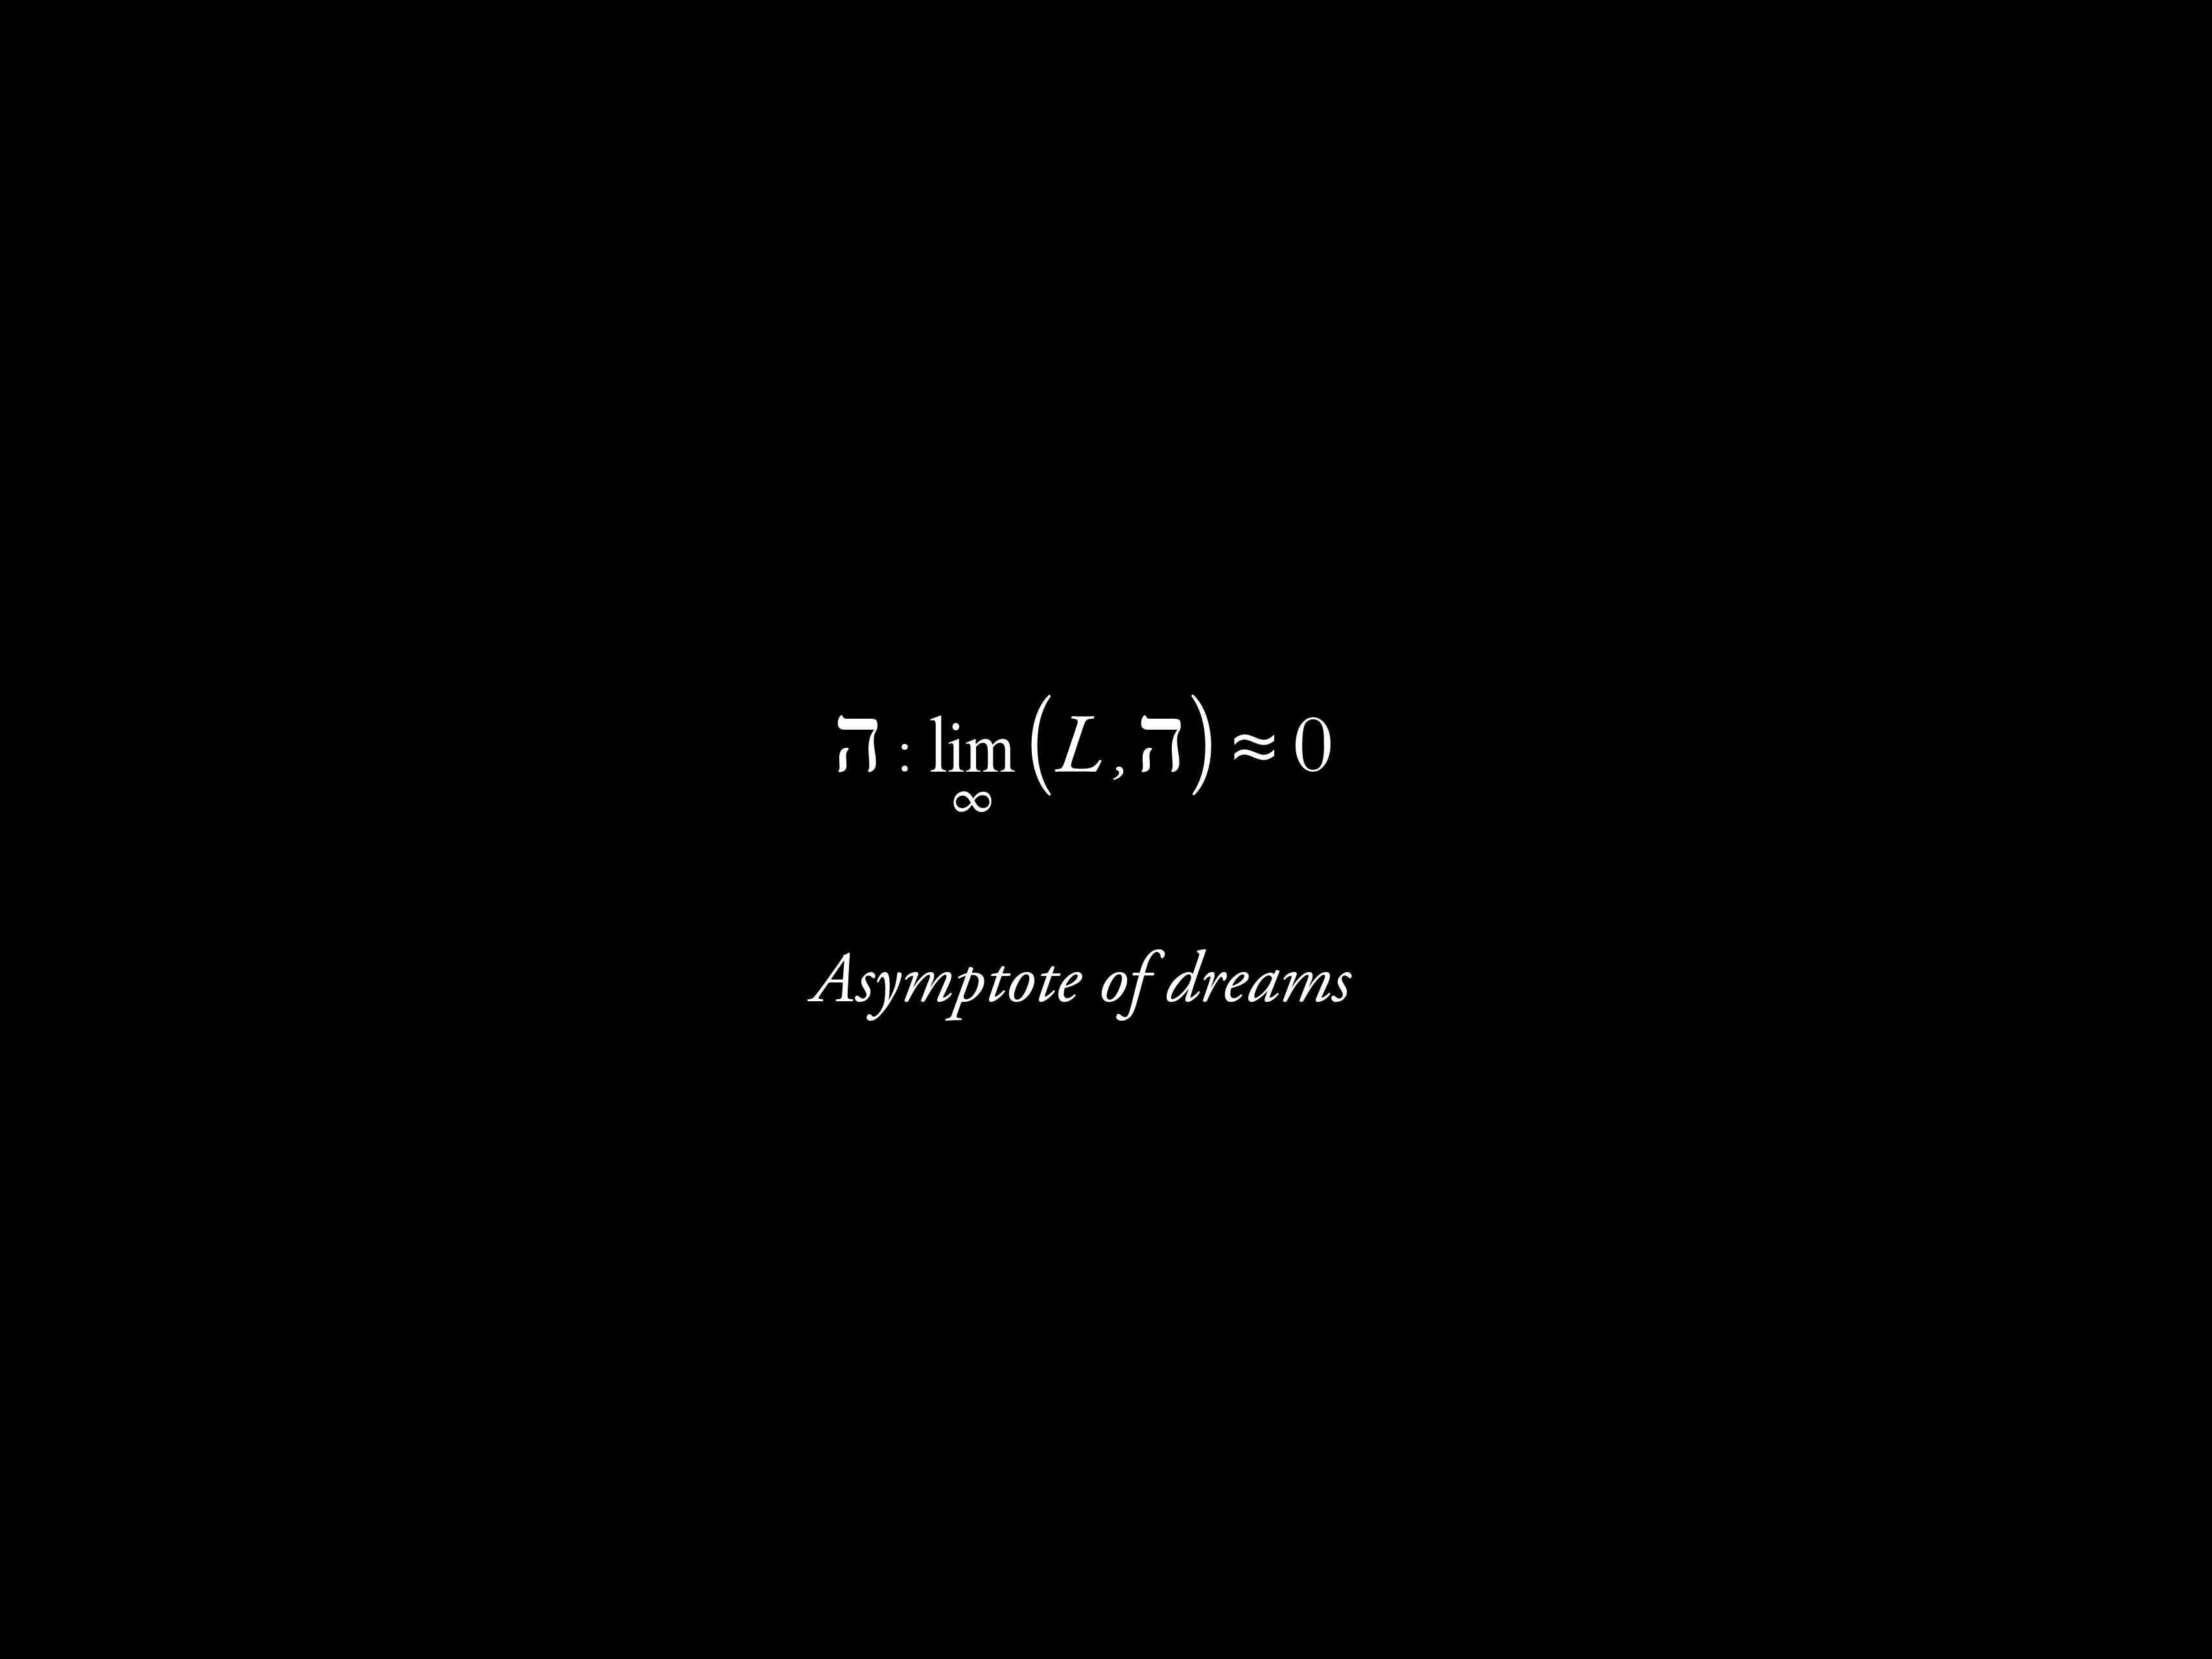 MoMA-asymptote of dreams-01